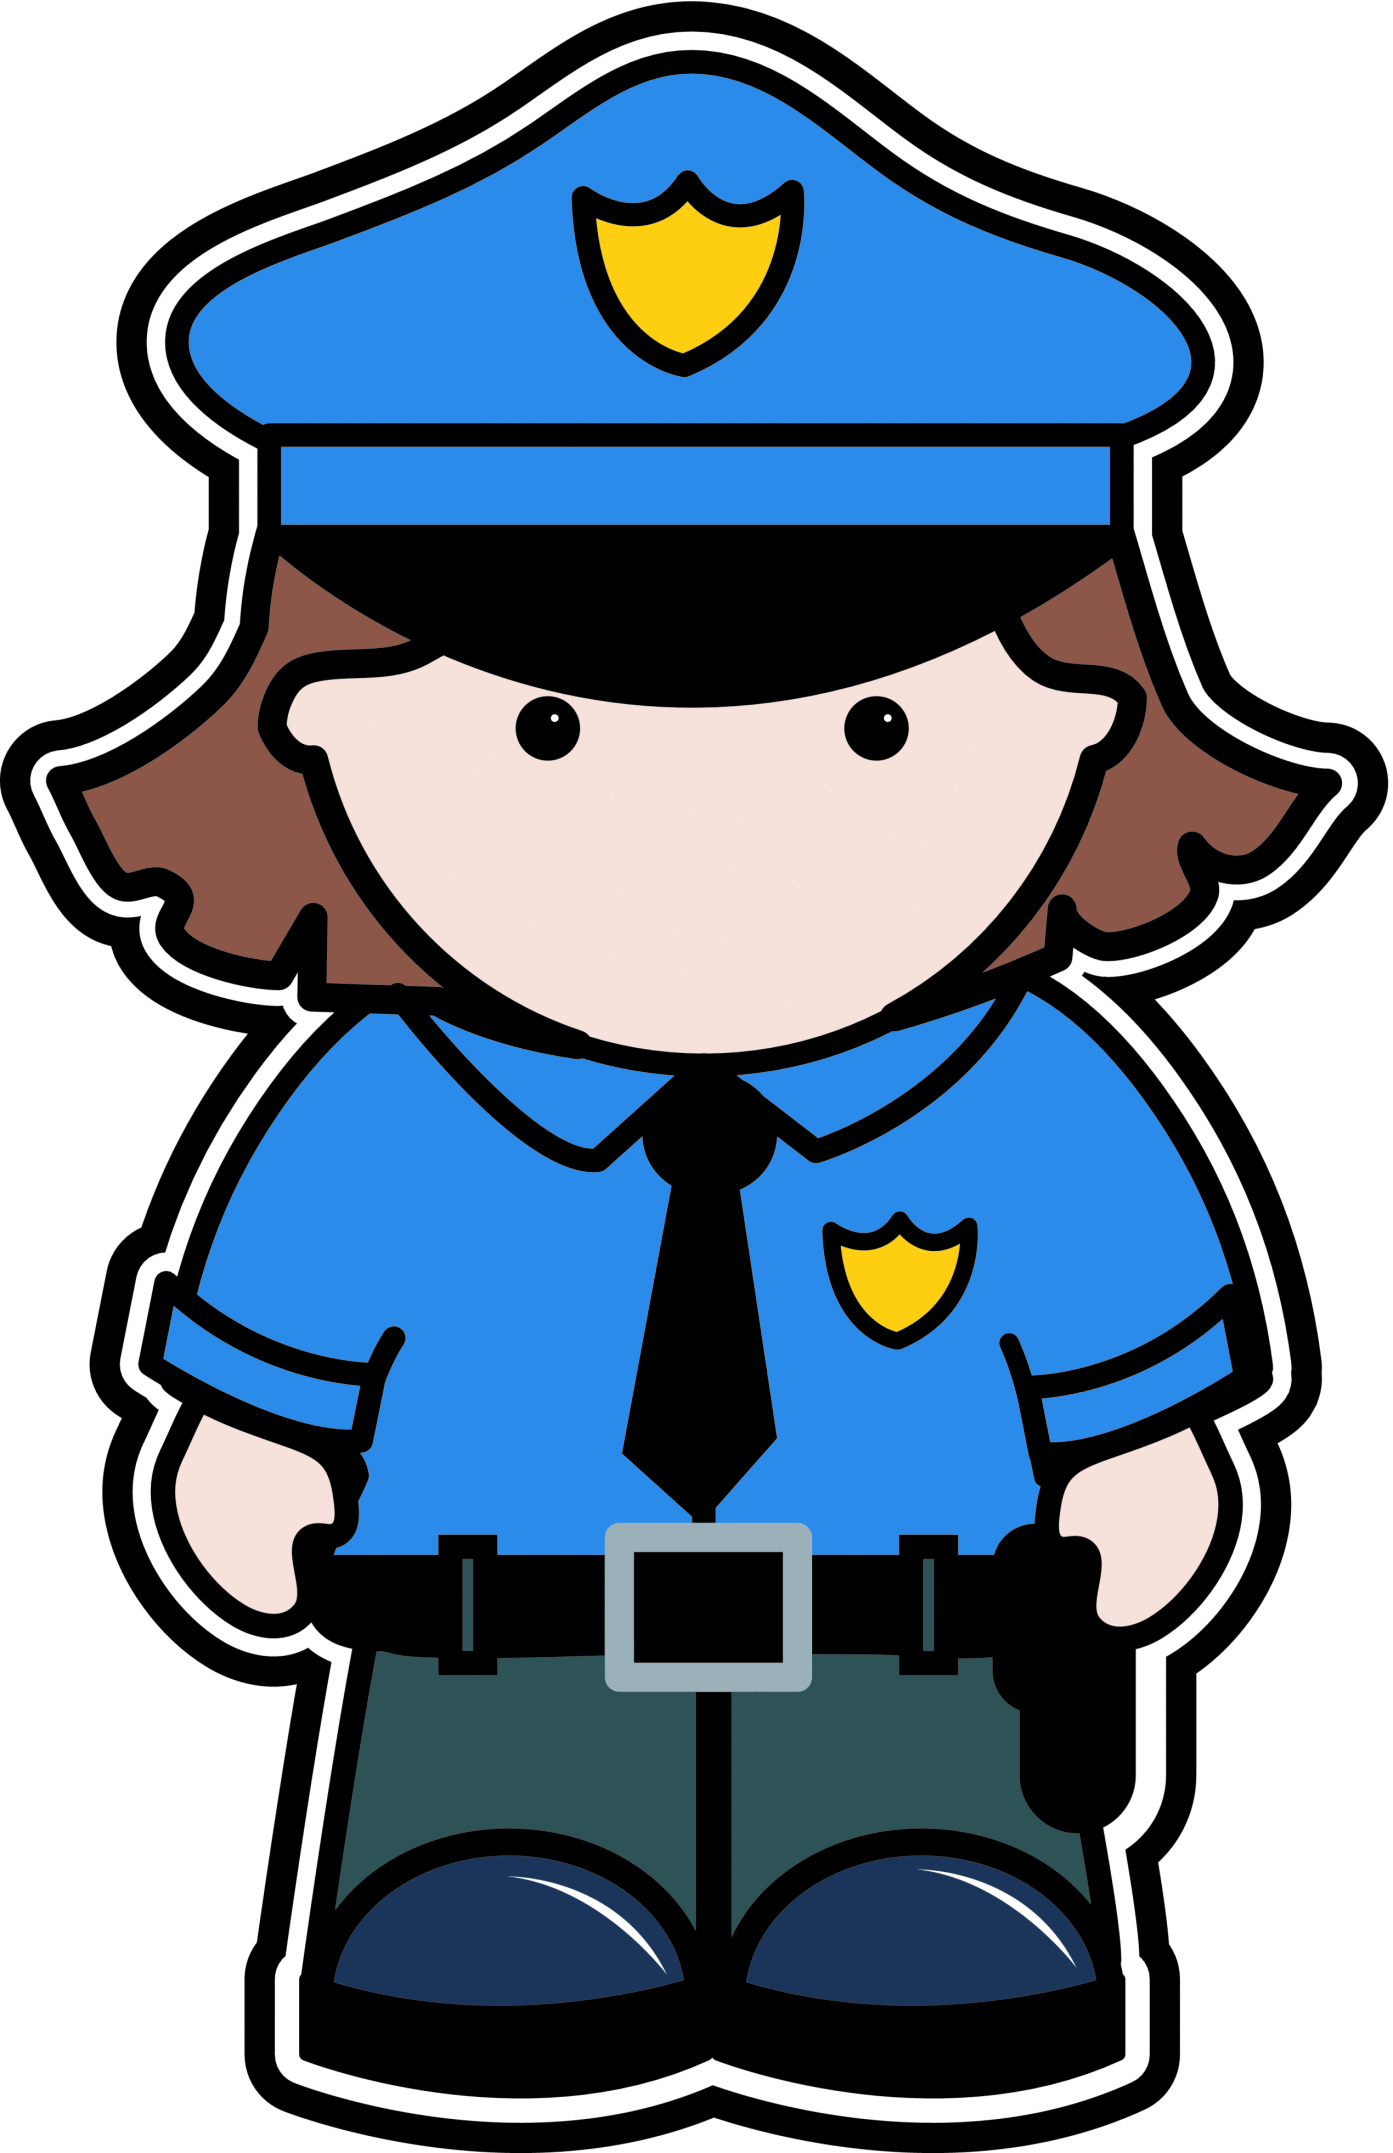 1393x2153 Clip Art Police Clipart Image 1